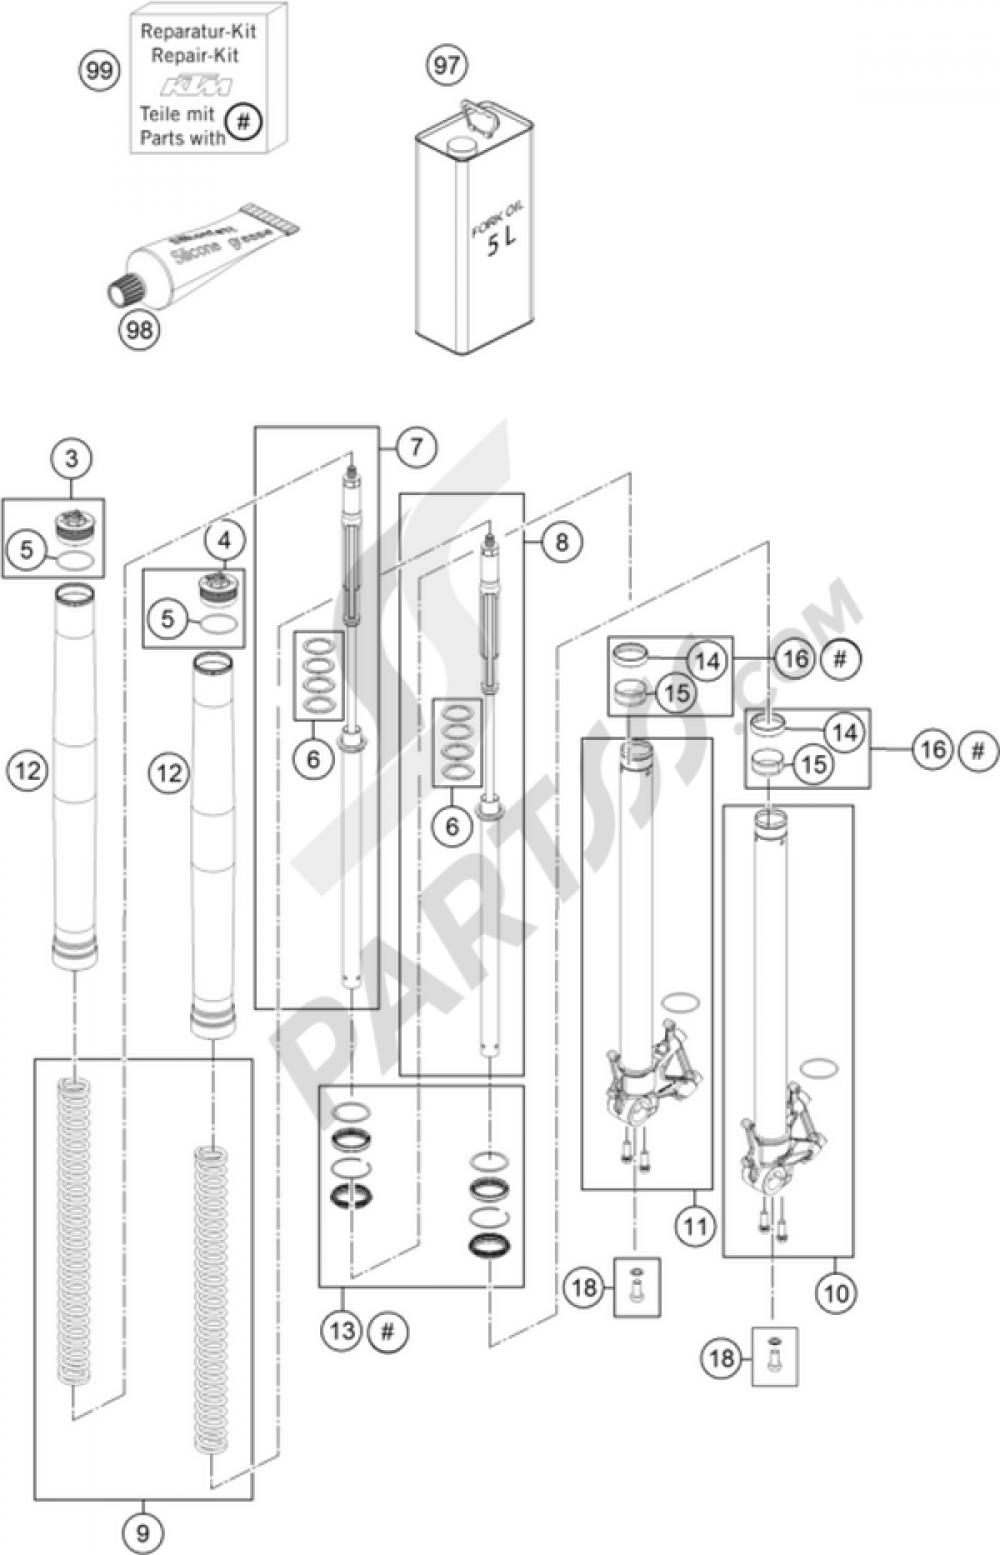 Front Fork Disassembled Ktm 1190 Adventure R Abs 2016 Eu Wiring Diagram